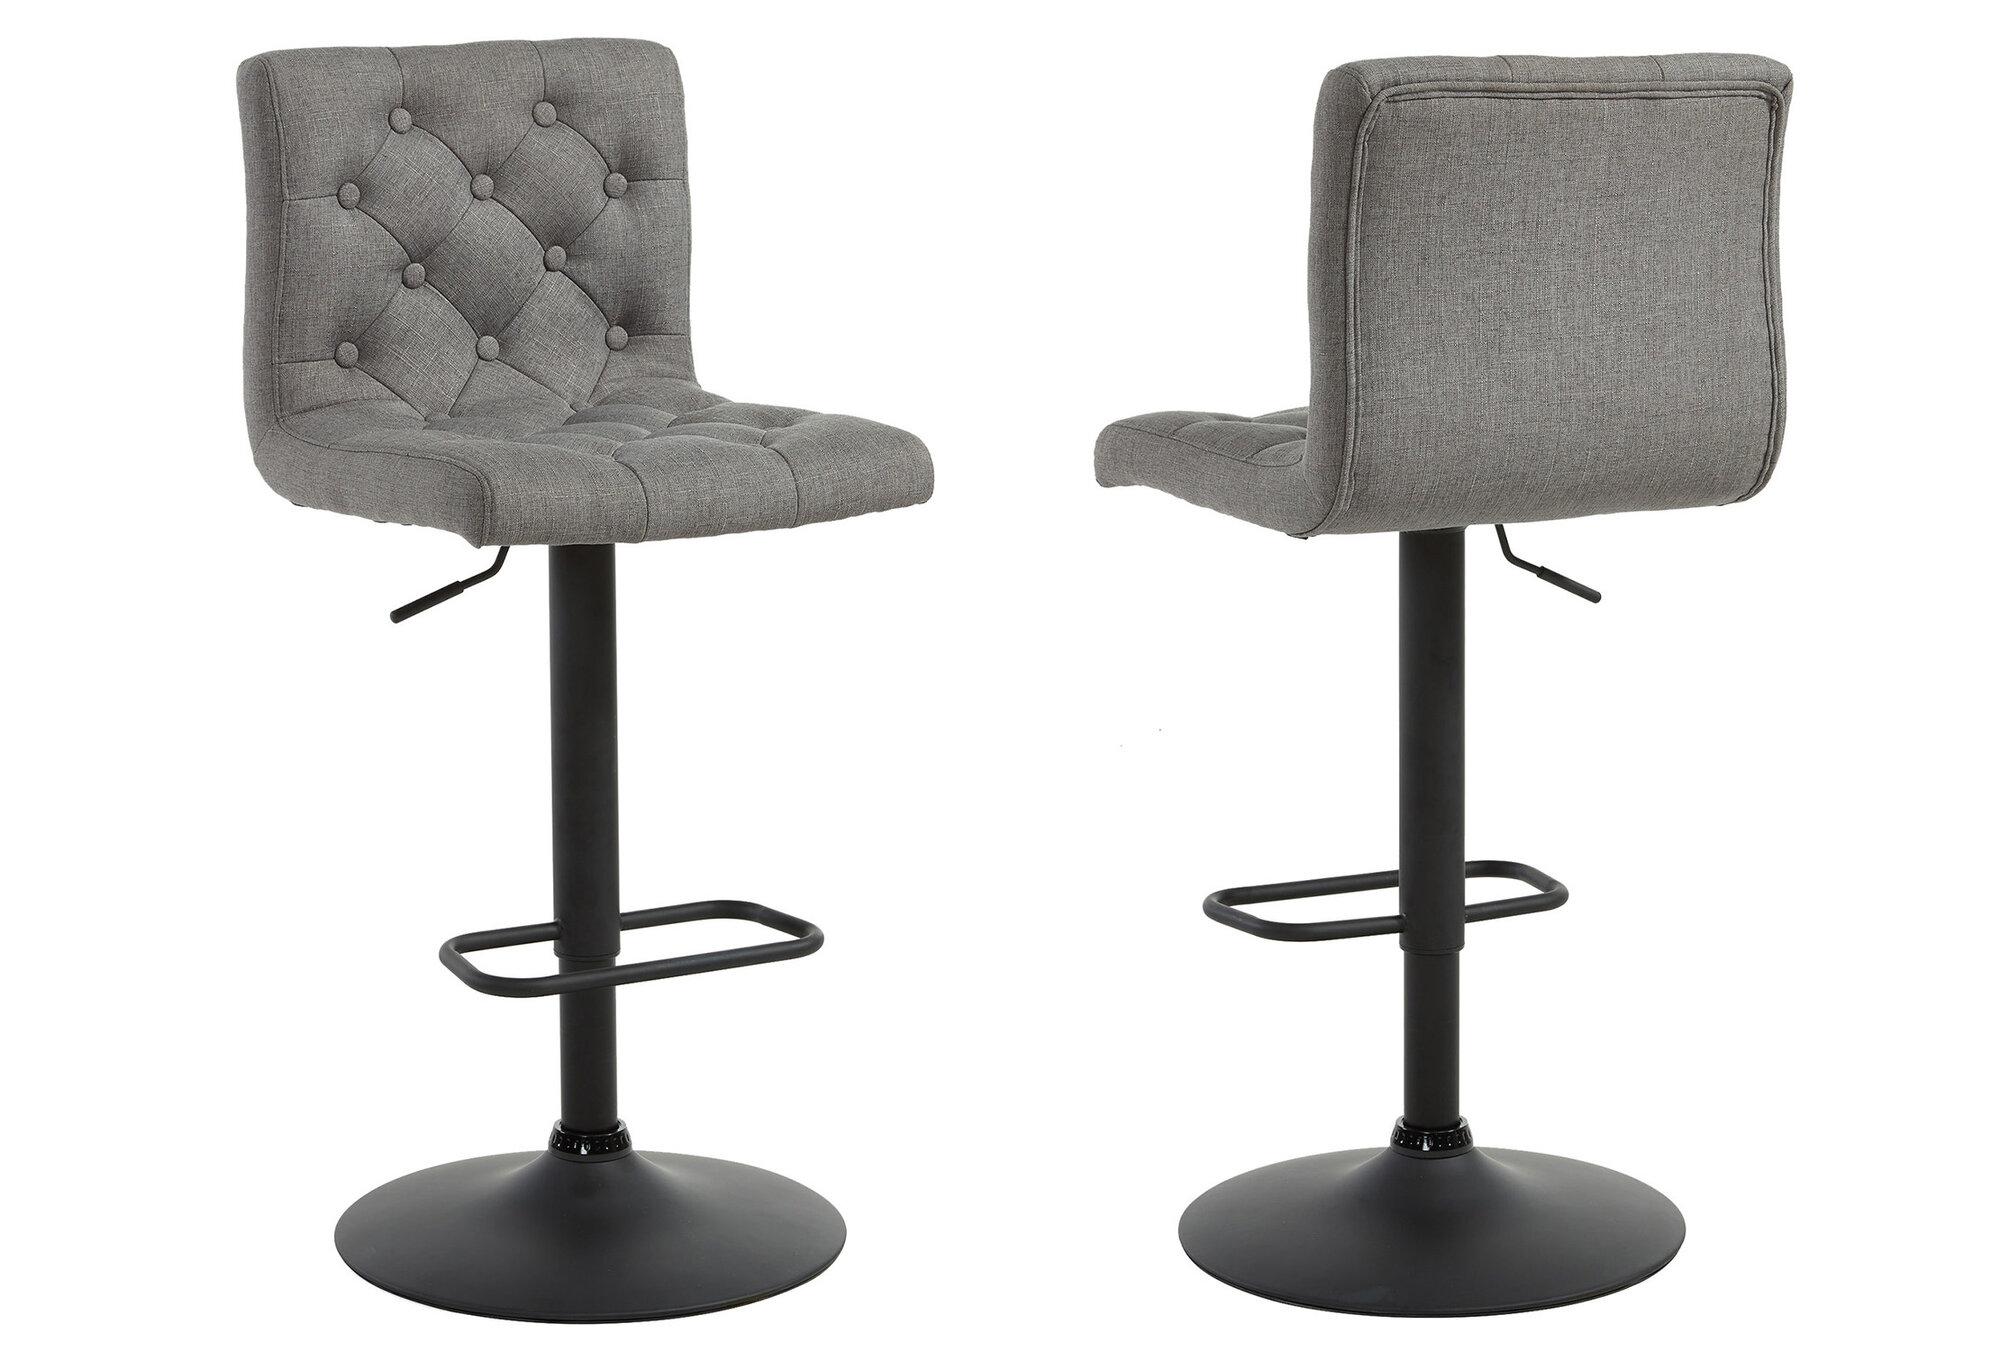 Astounding Details About Ebern Designs Witney Adjustable Height Swivel Bar Stool Gray Set Of 2 Ncnpc Chair Design For Home Ncnpcorg